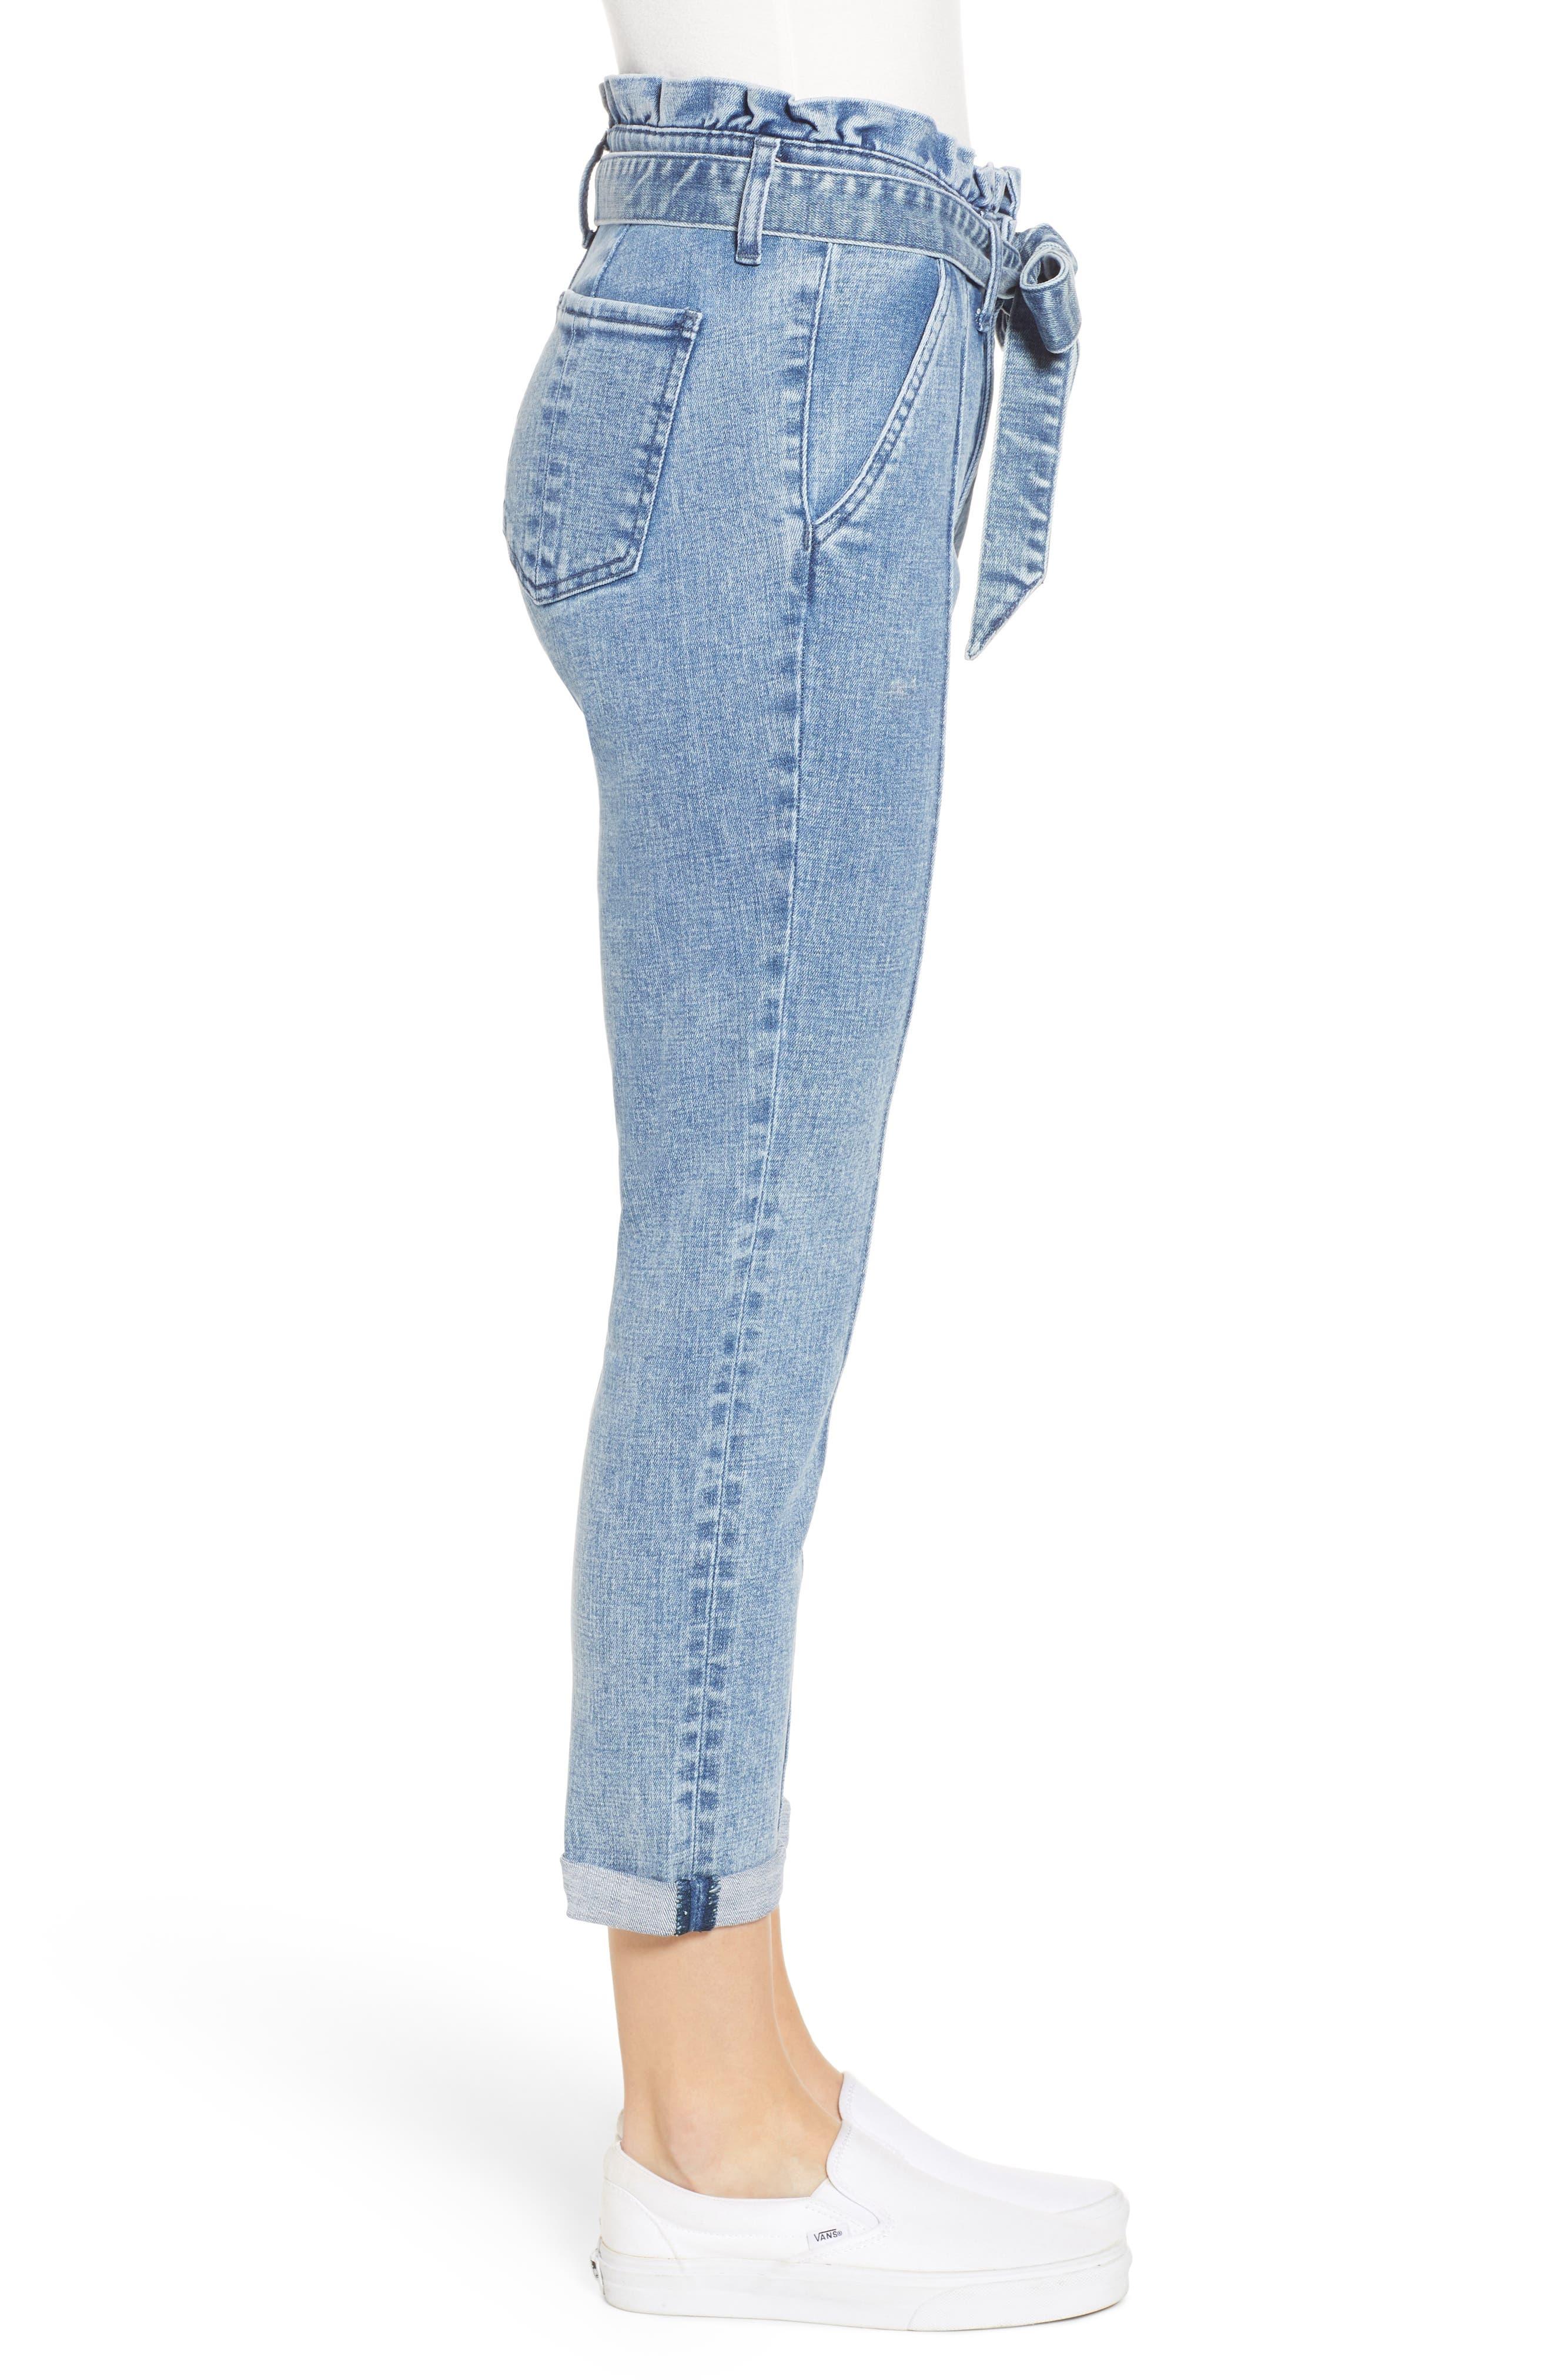 PROSPERITY DENIM, Paperbag Waist Crop Skinny Jeans, Alternate thumbnail 4, color, MEDIUM LIGHT WASH